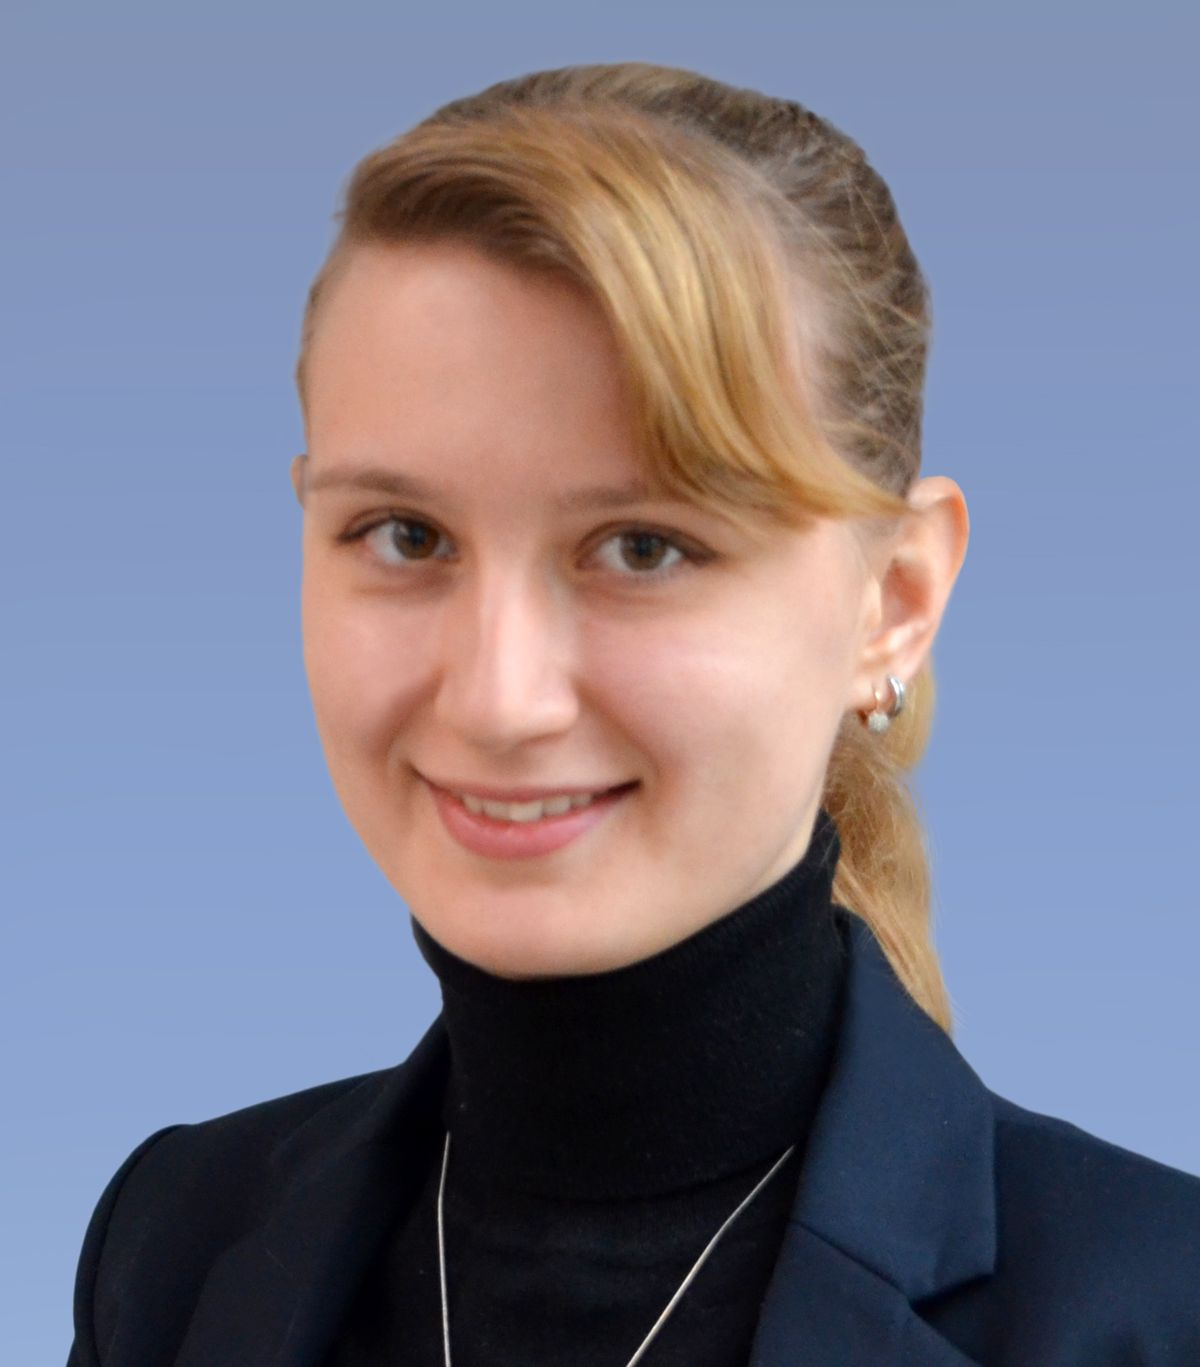 Nataliia Roskladka